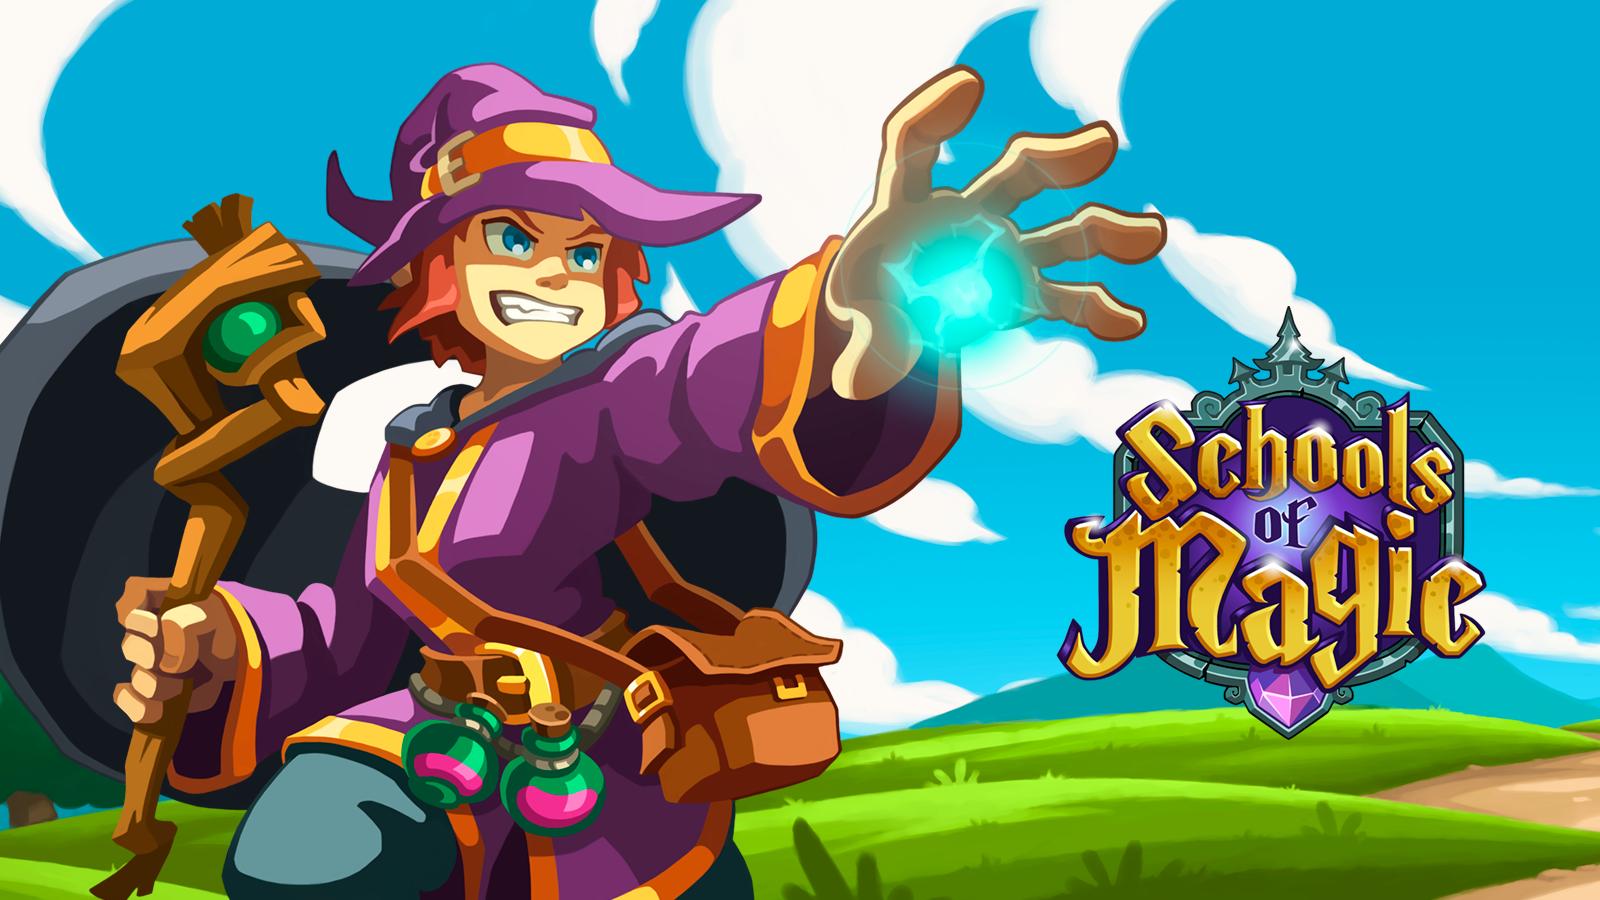 Schools of Magic banner